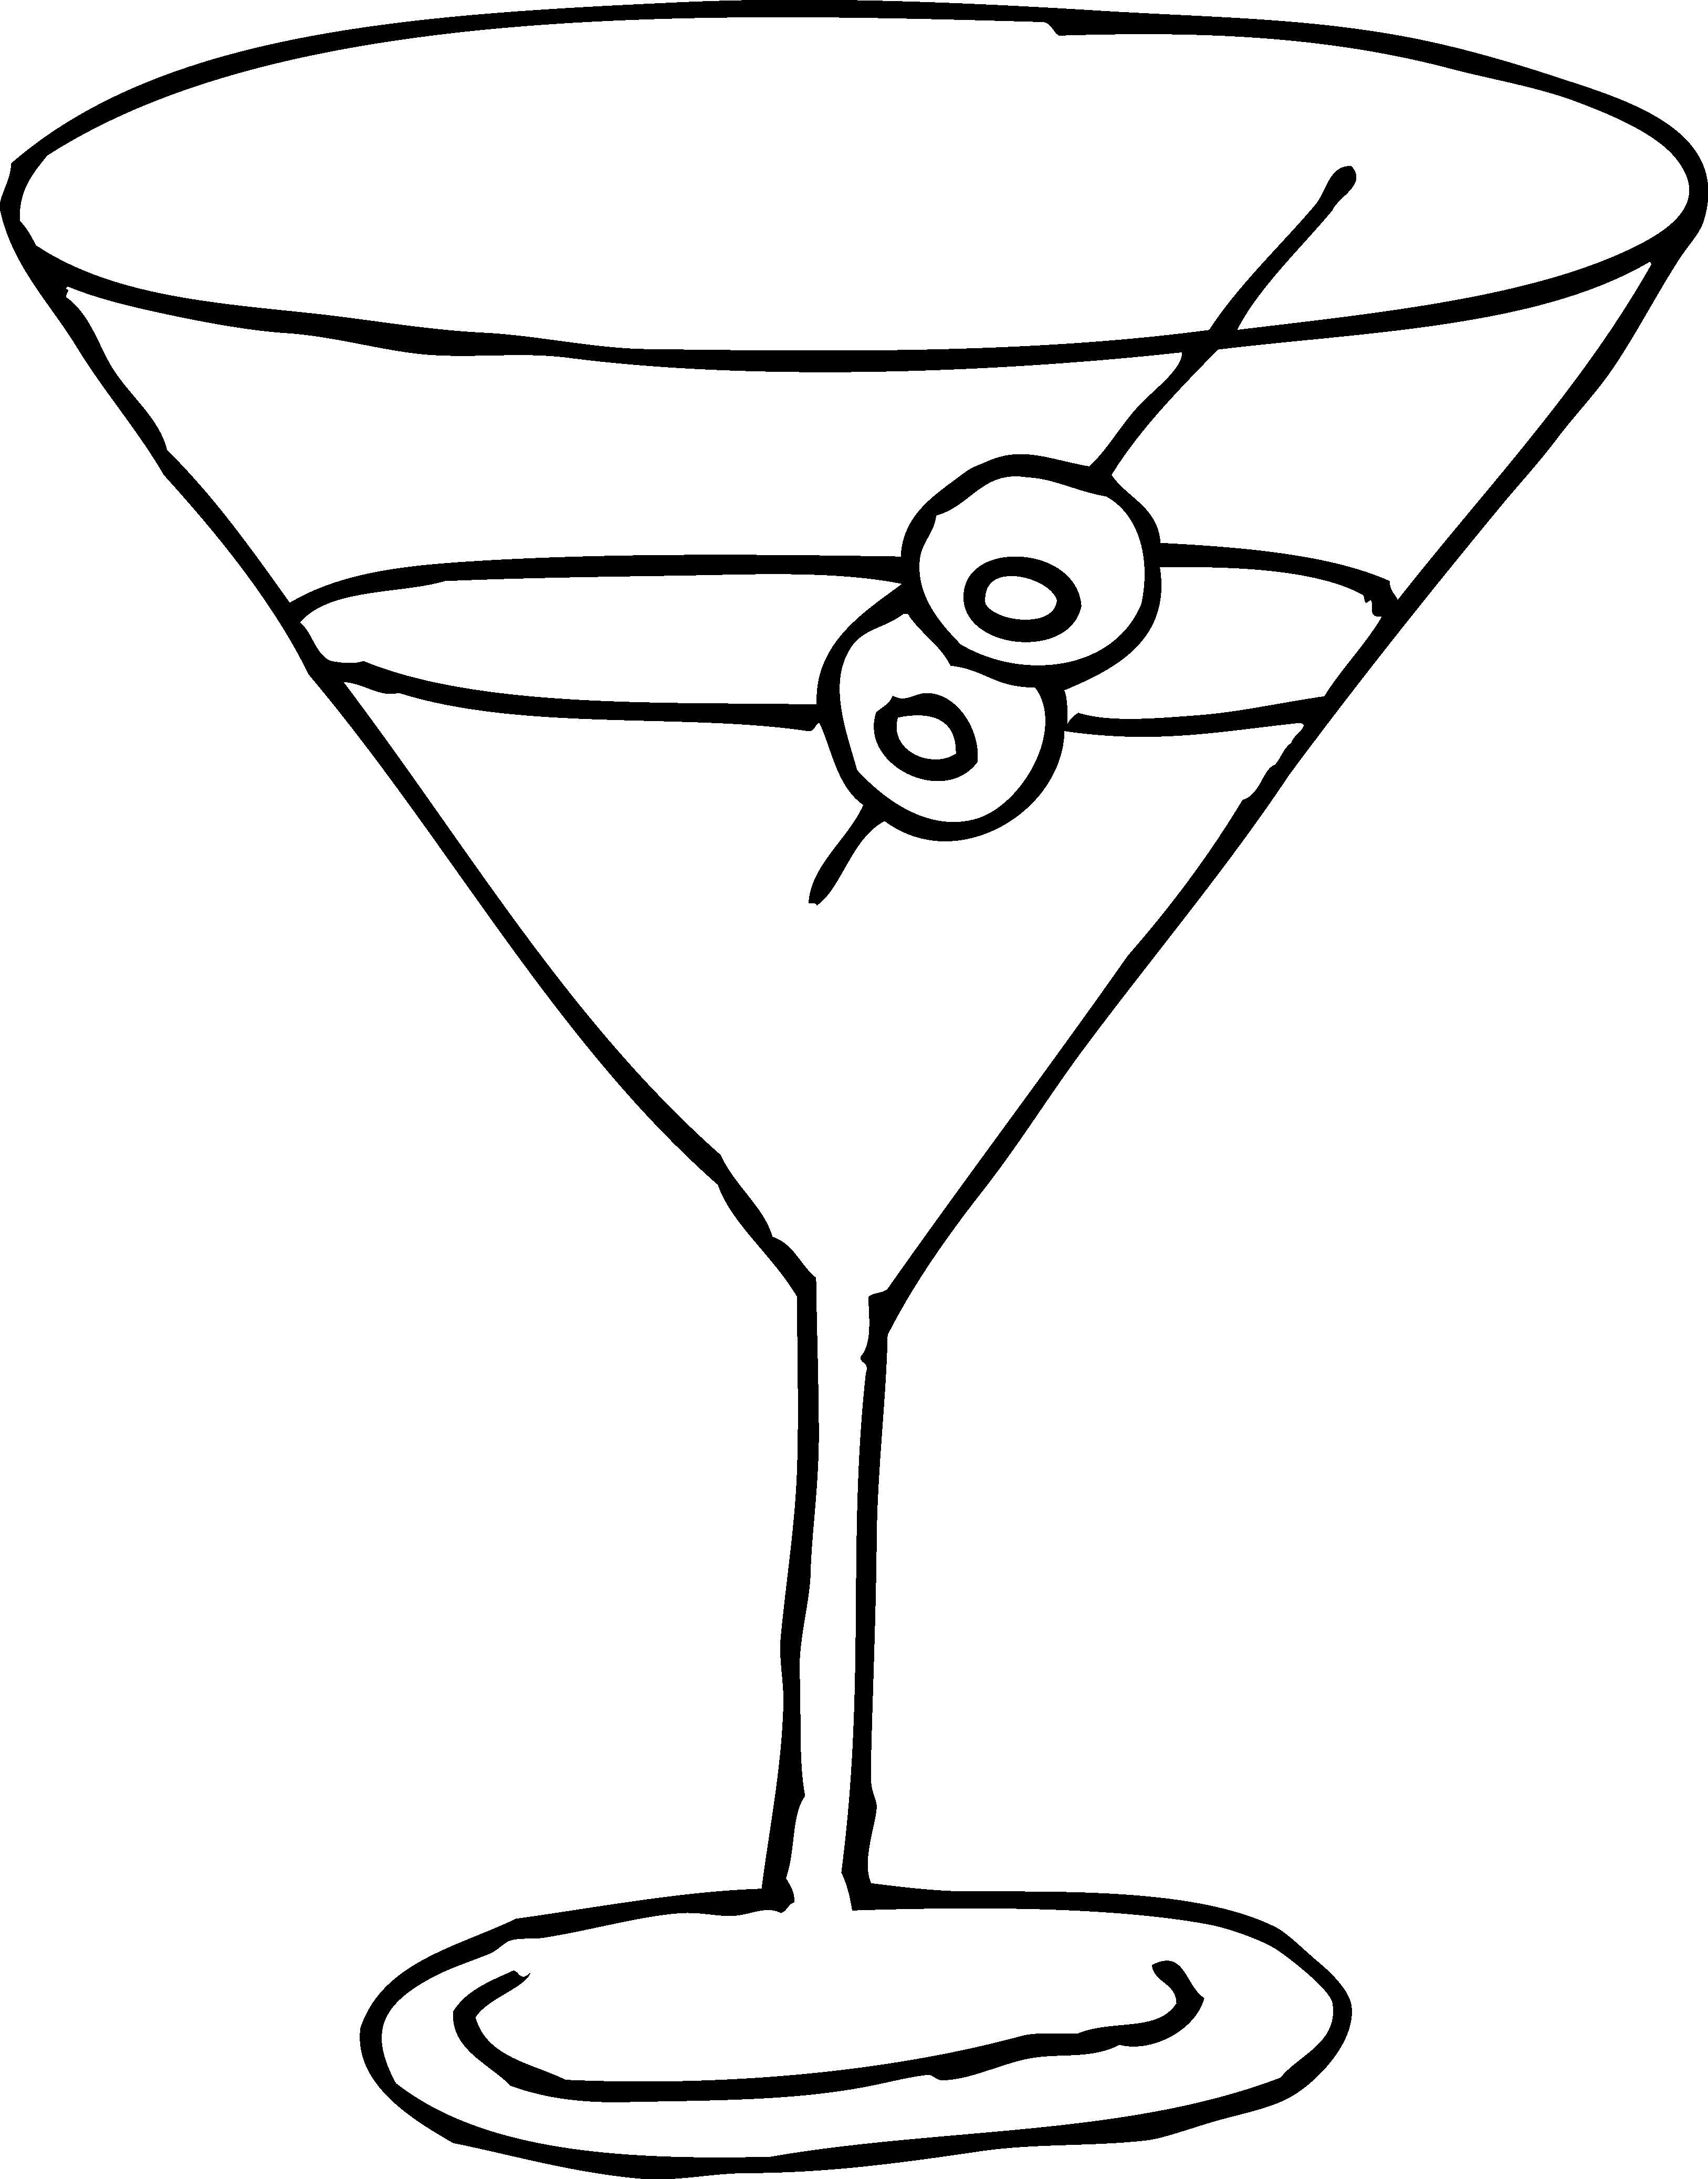 Alcohol clipart cocktail glass Clipart Art Clip Download Image